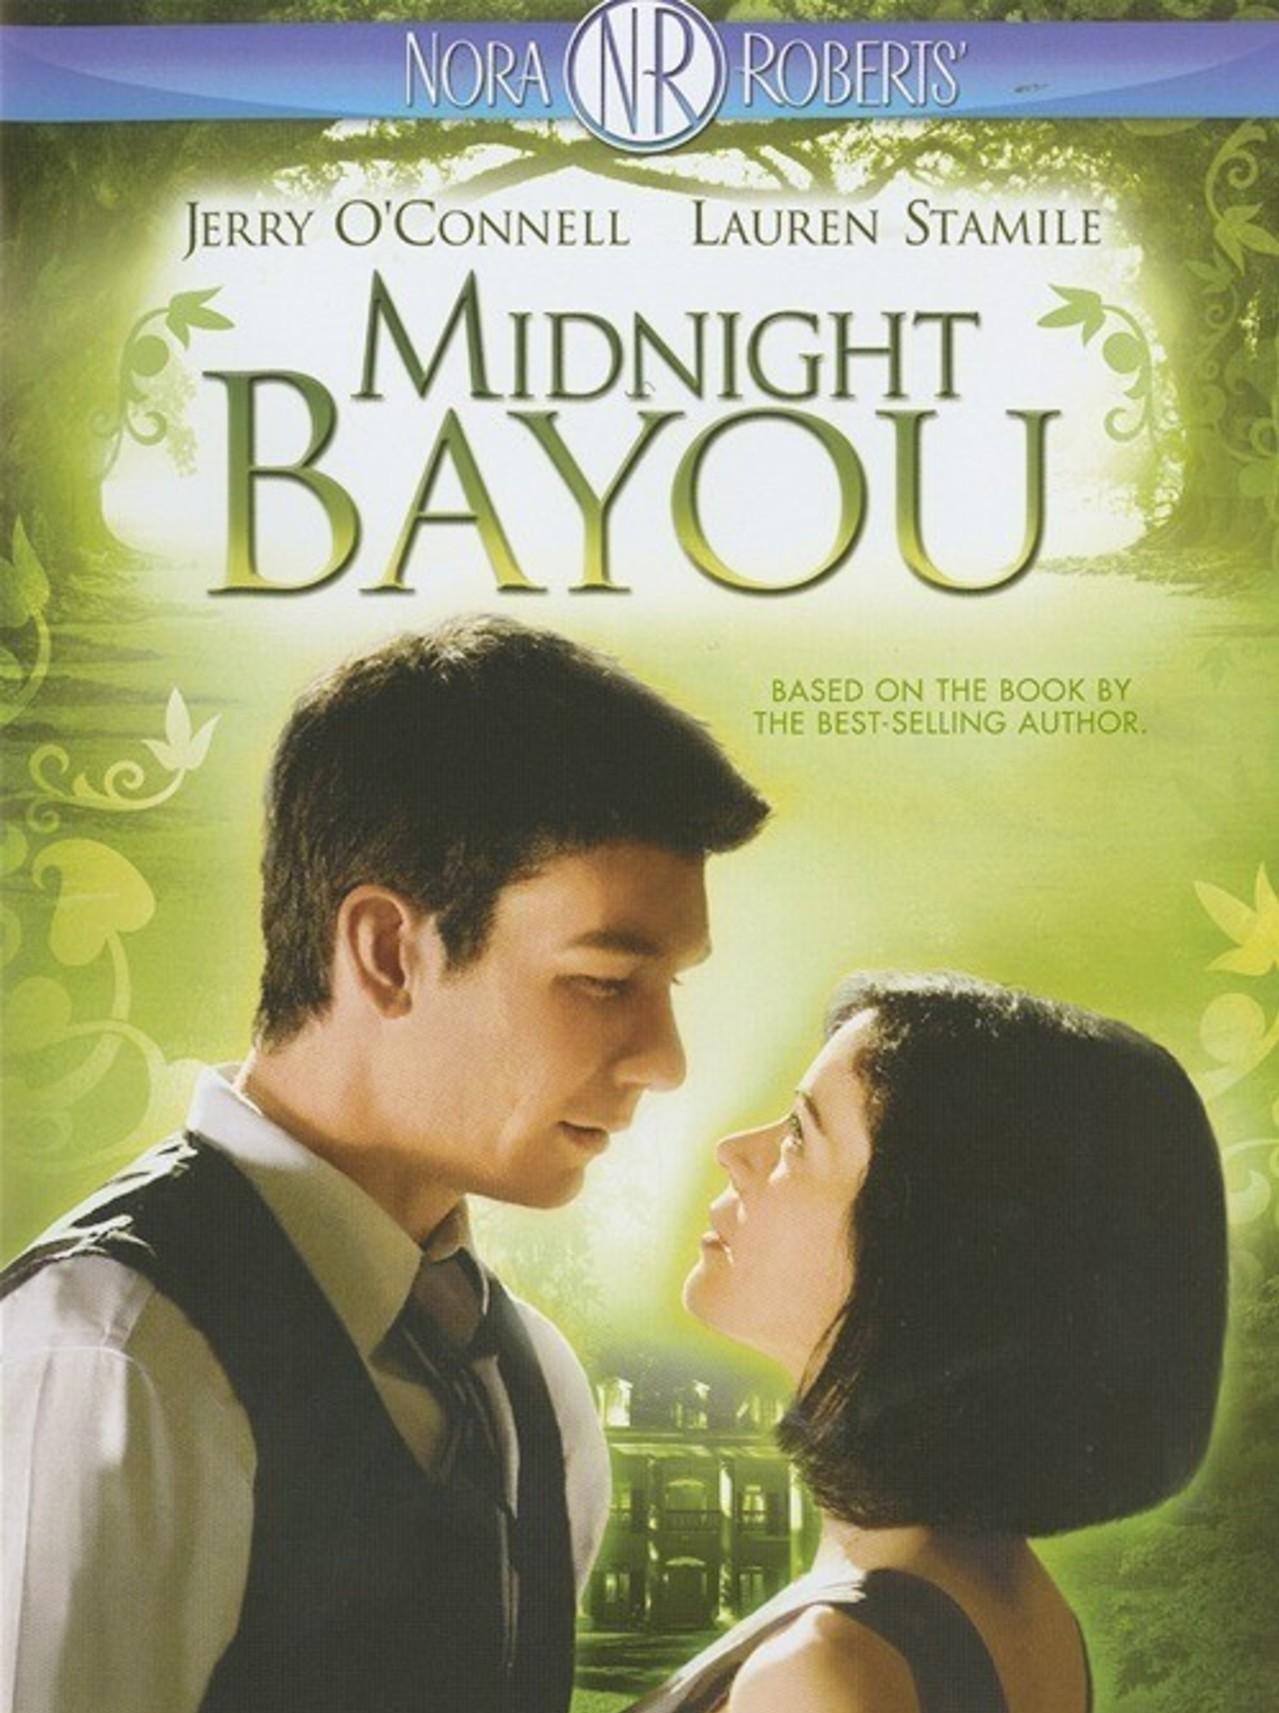 Midnight Bayou (TV Movie 2009) - IMDb